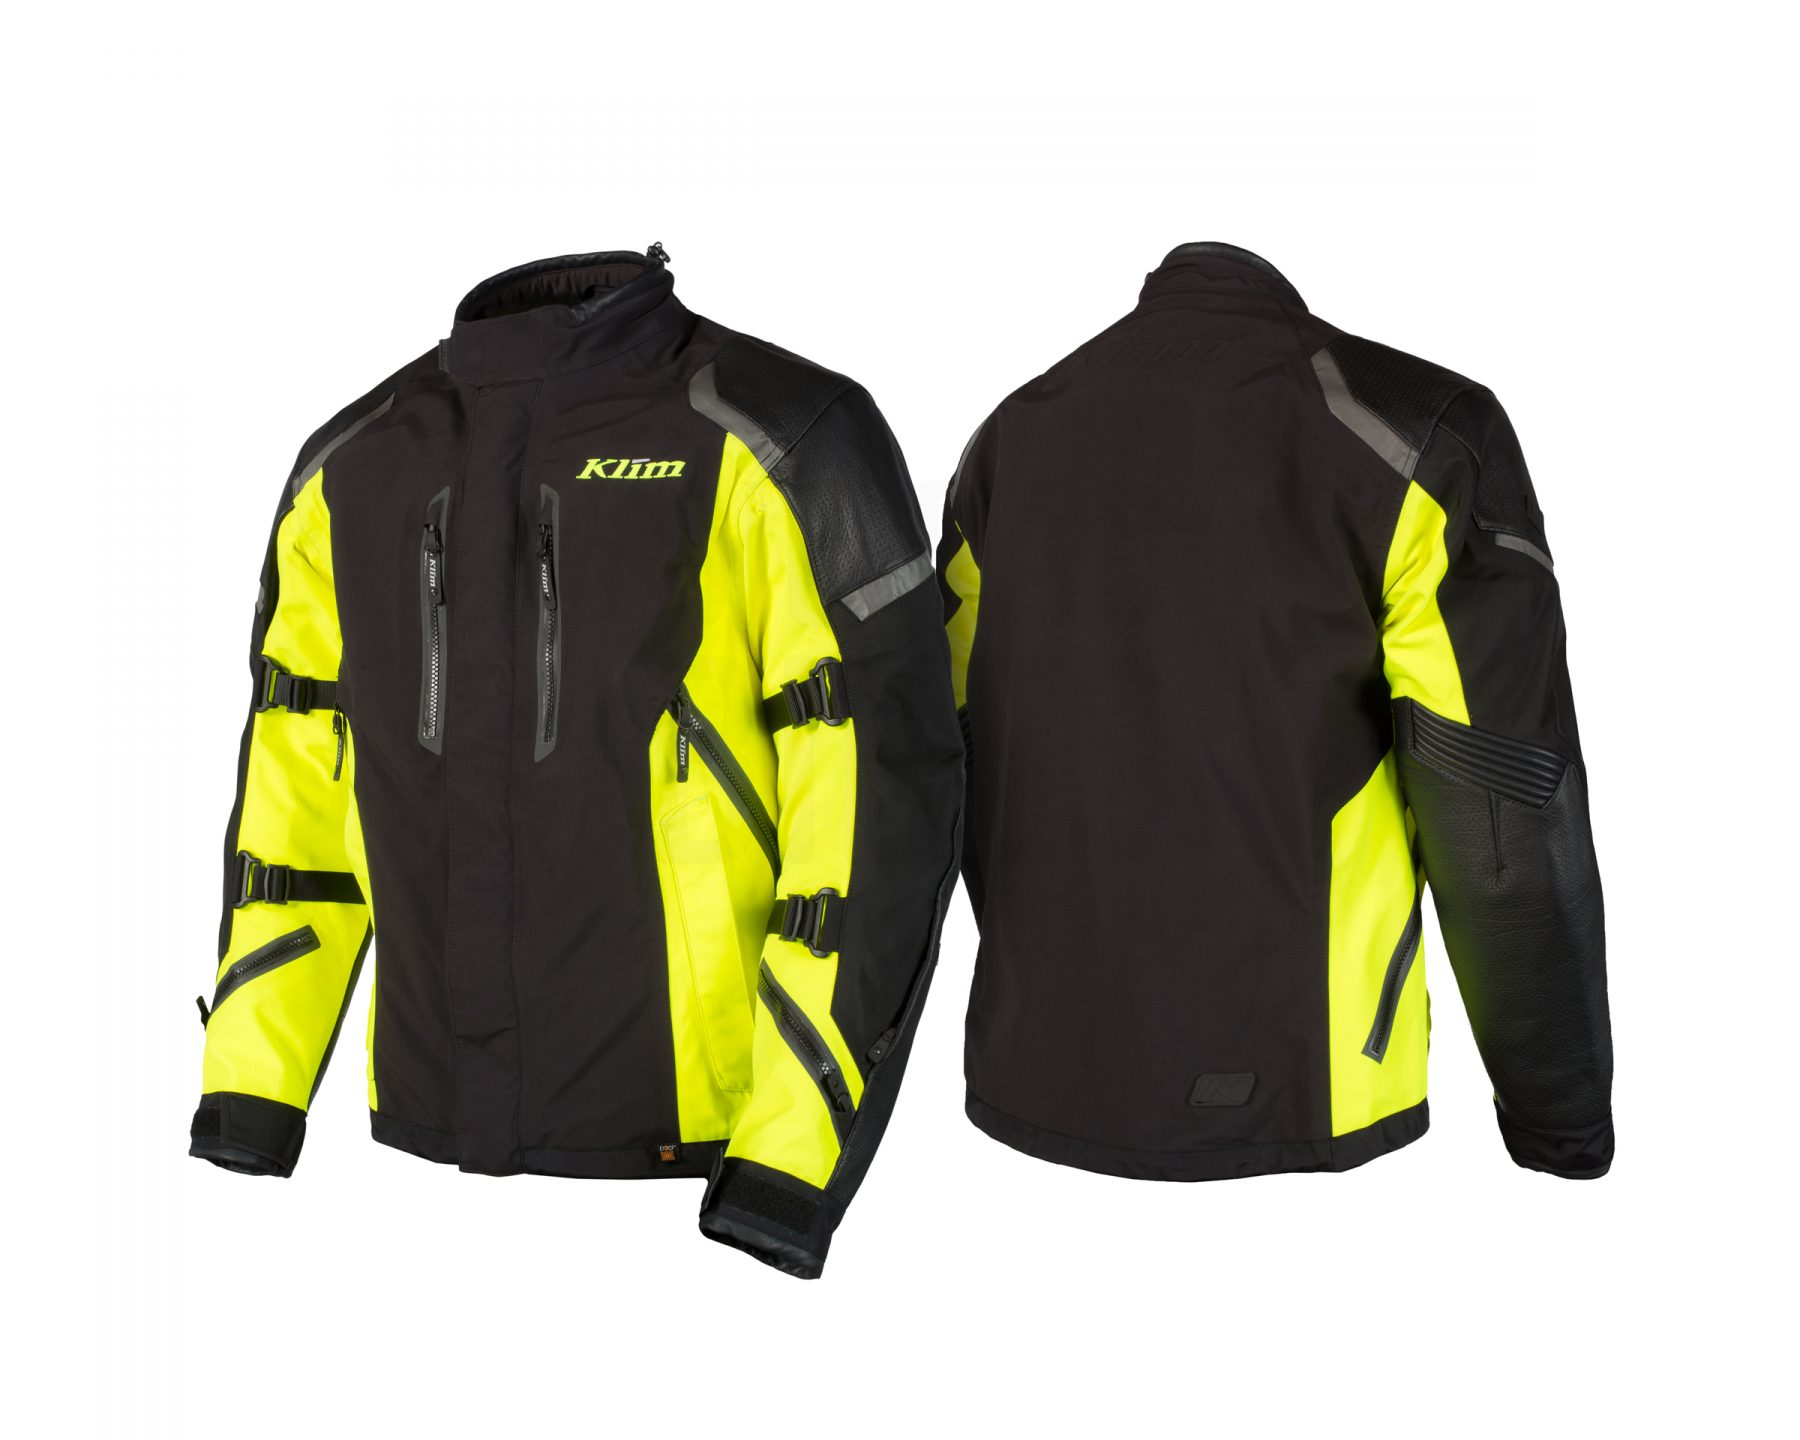 S Apex Jacket 3052-000-000_02